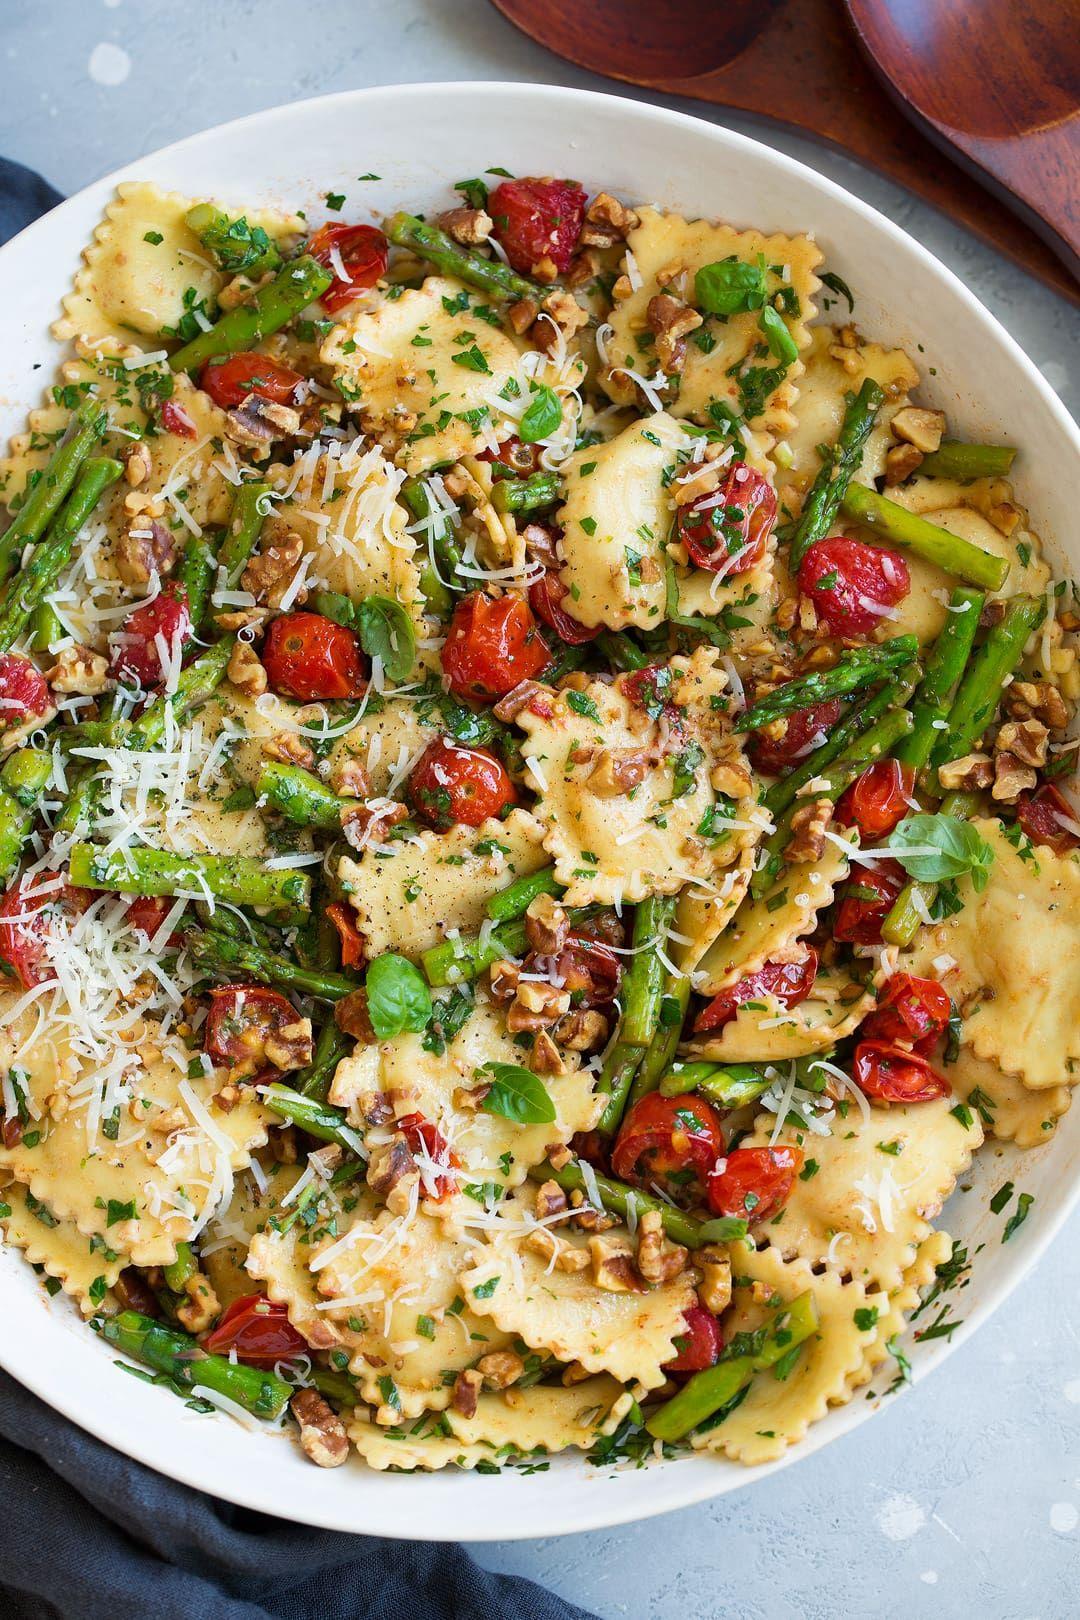 Ravioli with Tomatoes Asparagus Garlic and Herbs -